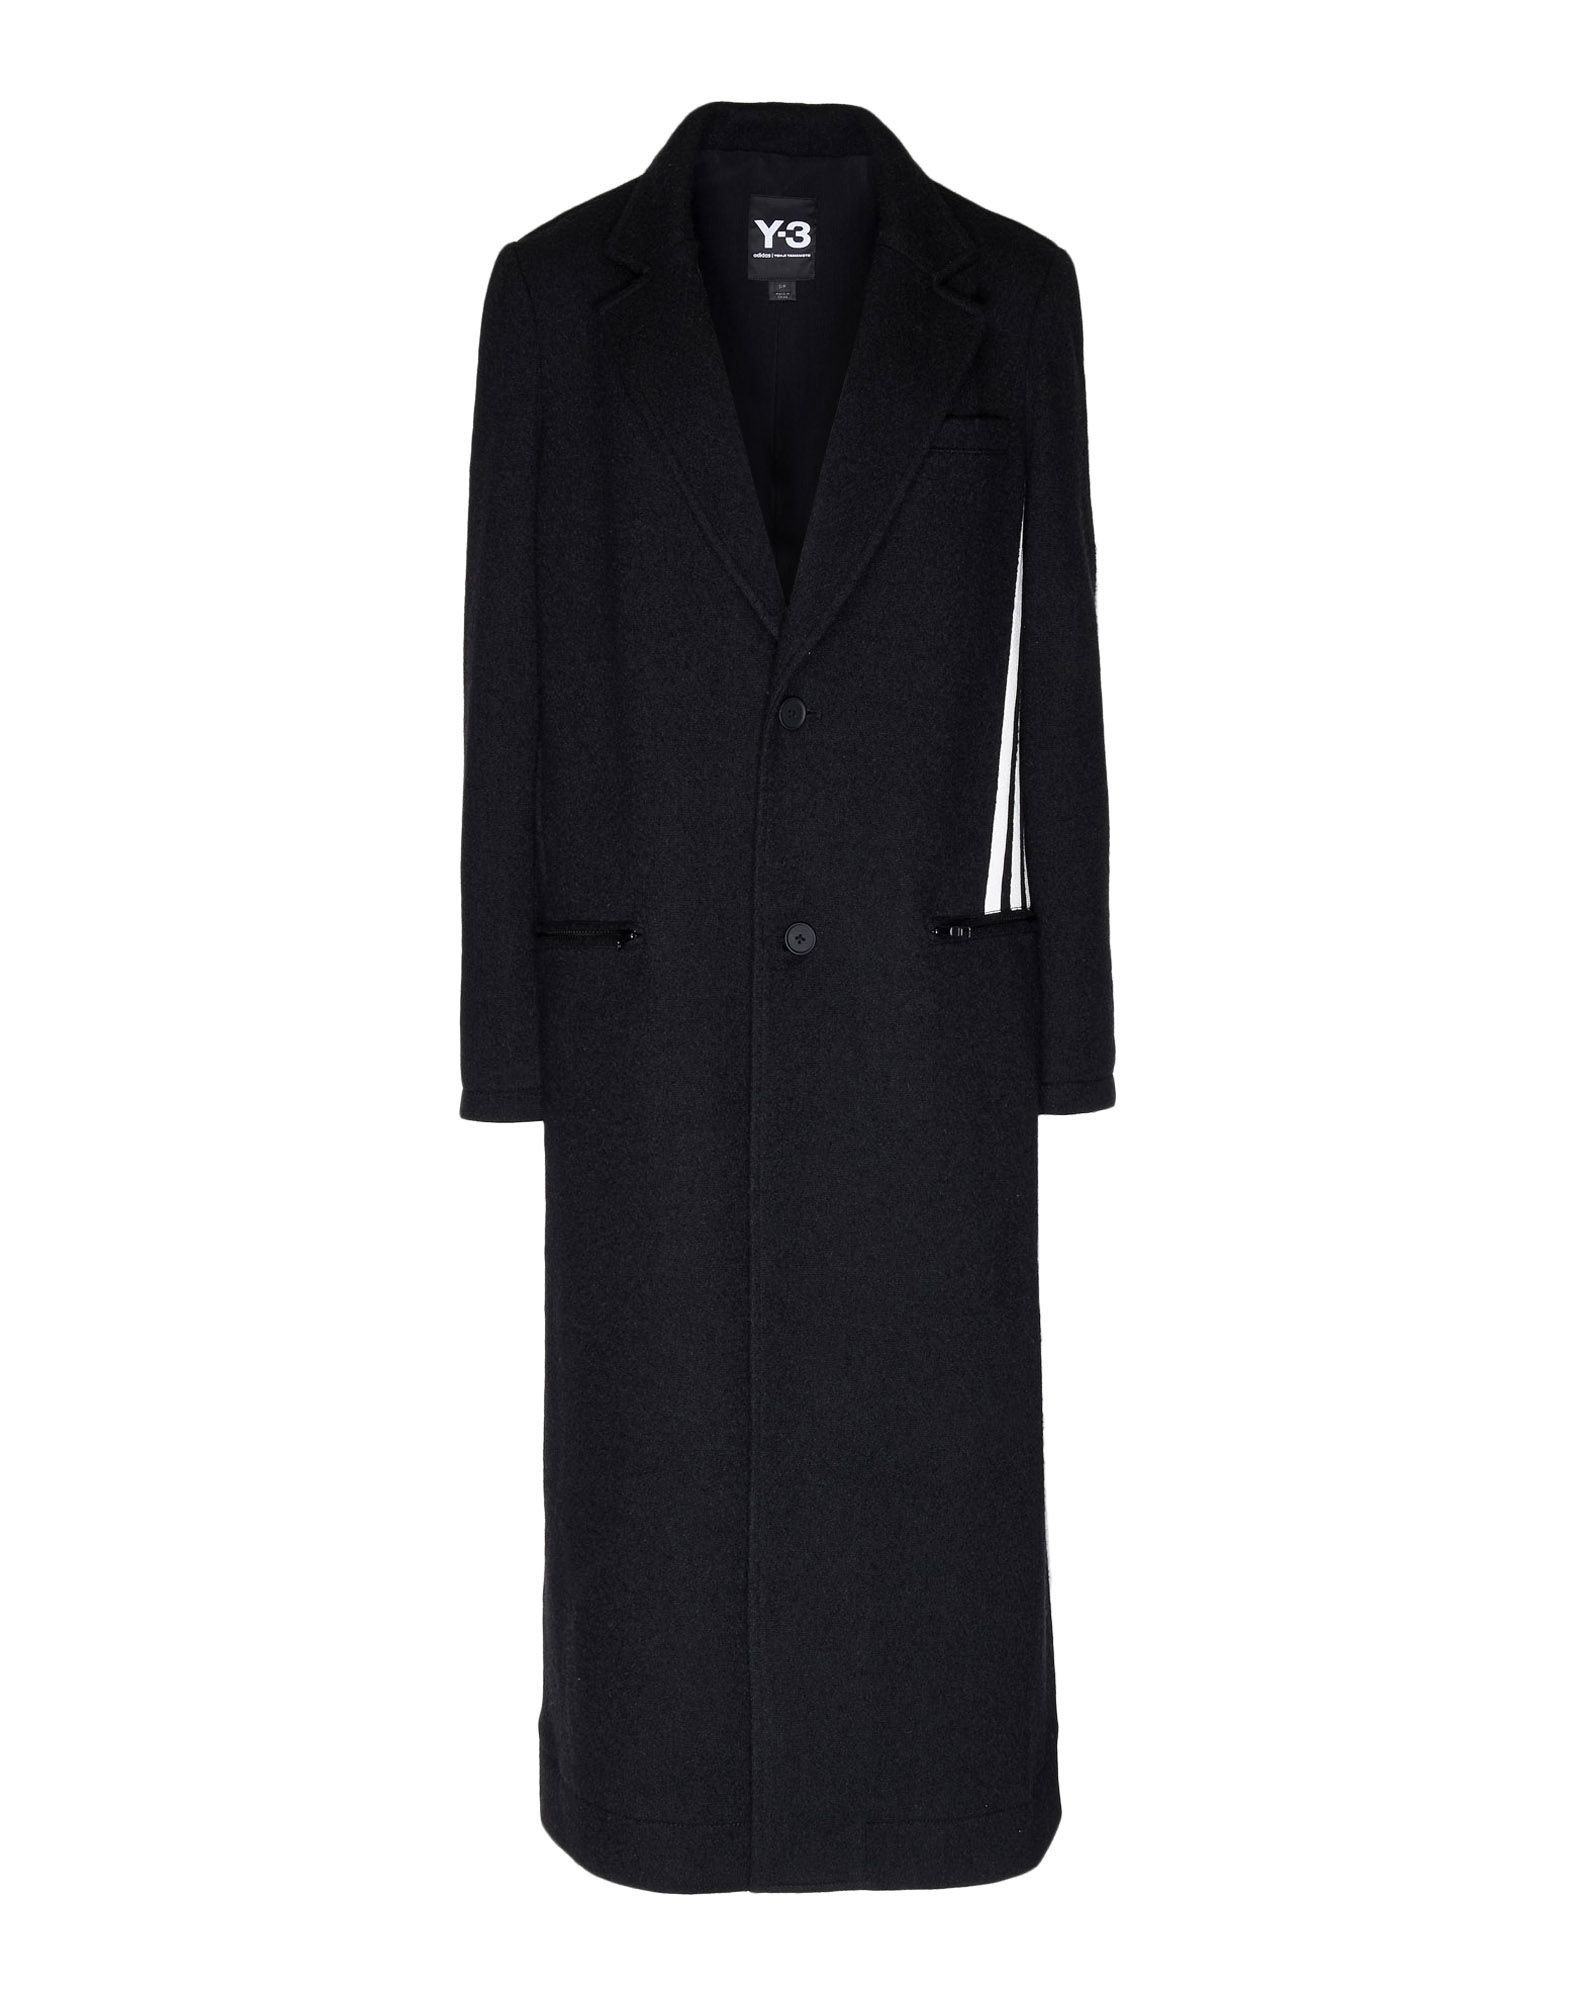 Y-3 Y-3 3-Stripes Tailored Wool Coat フォーマルジャケット レディース f